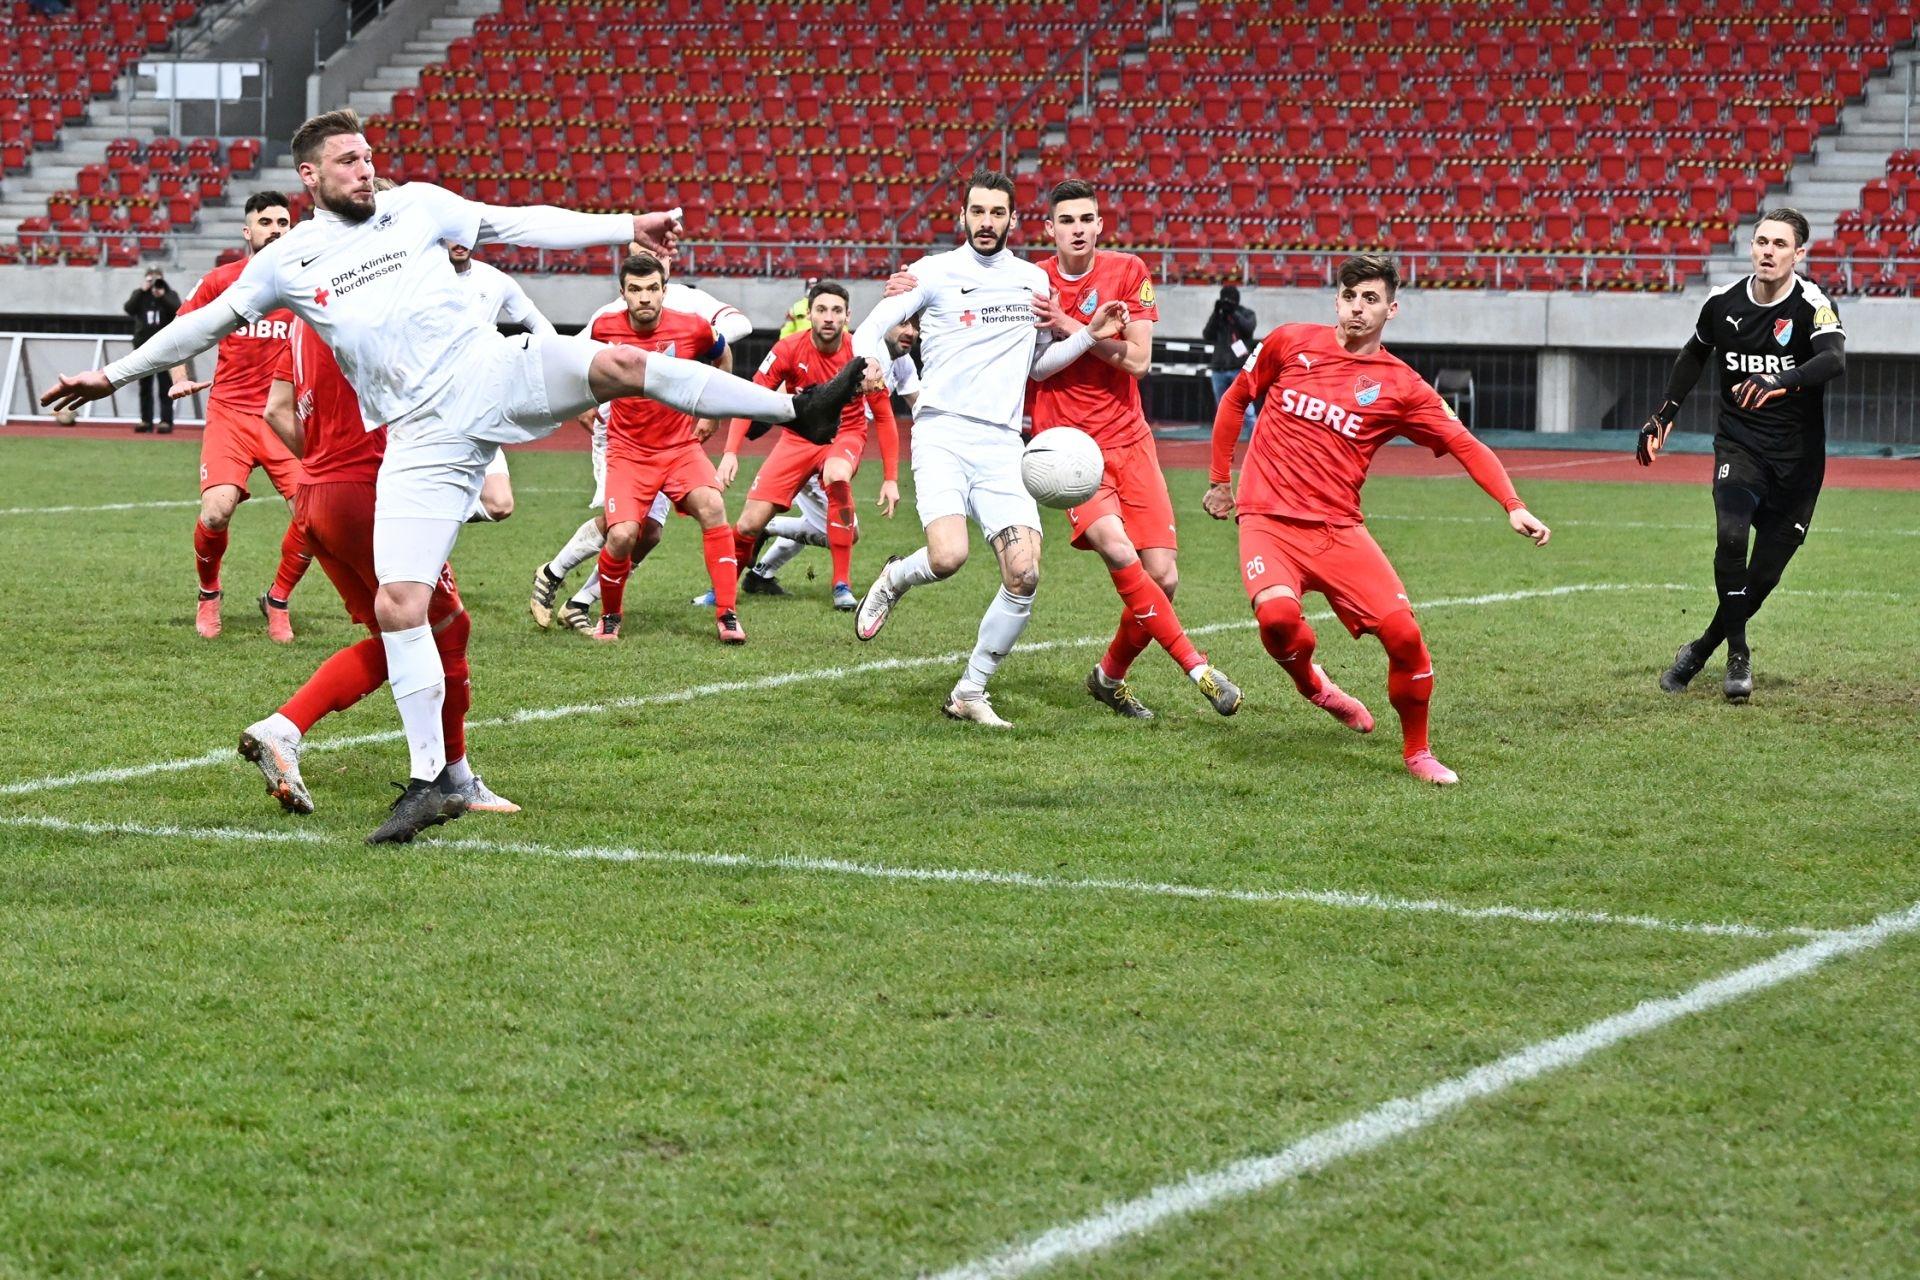 Regionalliga Südwest 2020/21, KSVHessen Kassel, TSV Steinbach Haiger, Endstand 2:1, Sebastian Schmeer